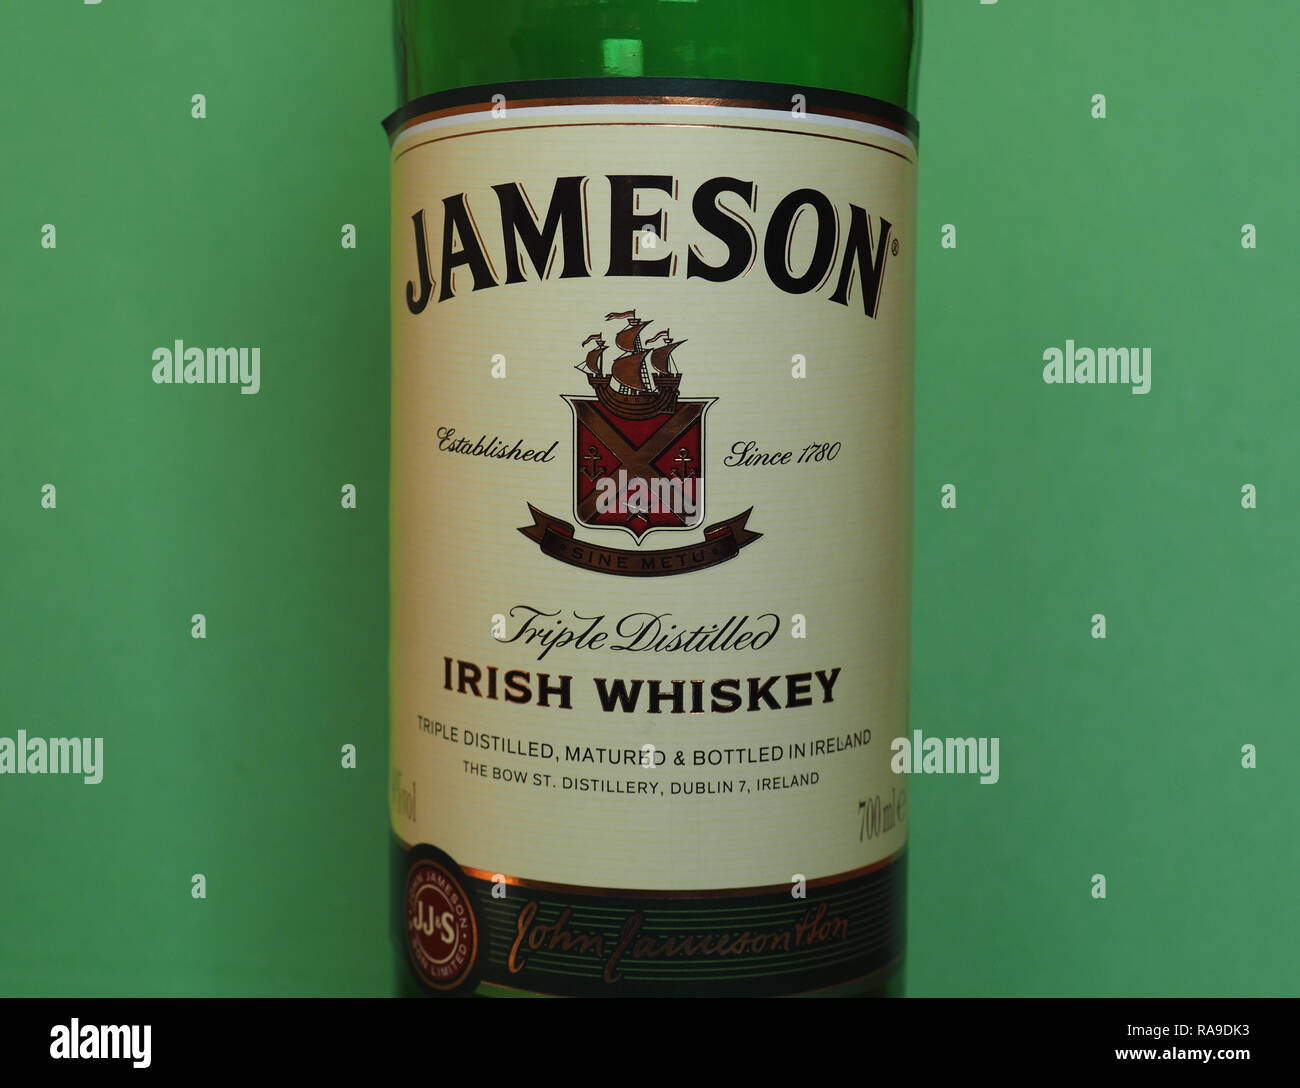 Jameson Whiskey Bottle Stock Photos & Jameson Whiskey Bottle Stock